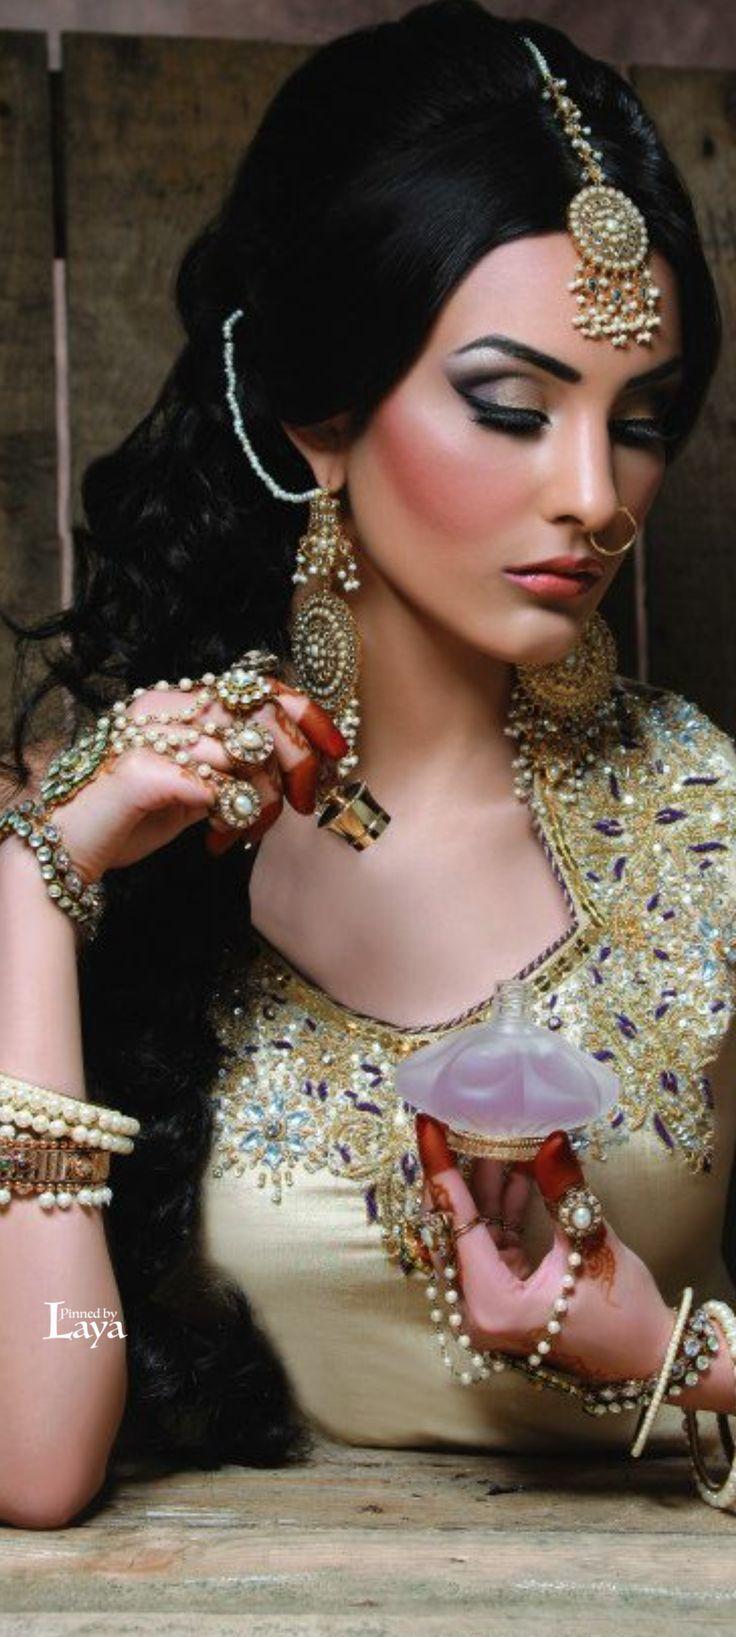 LAYA; regal gold South Asian bridal look. Her maang tikka and panja are so intricate and match her lehenga. #IndianWedding, #SouthAsianWedding, #ShaadiShop